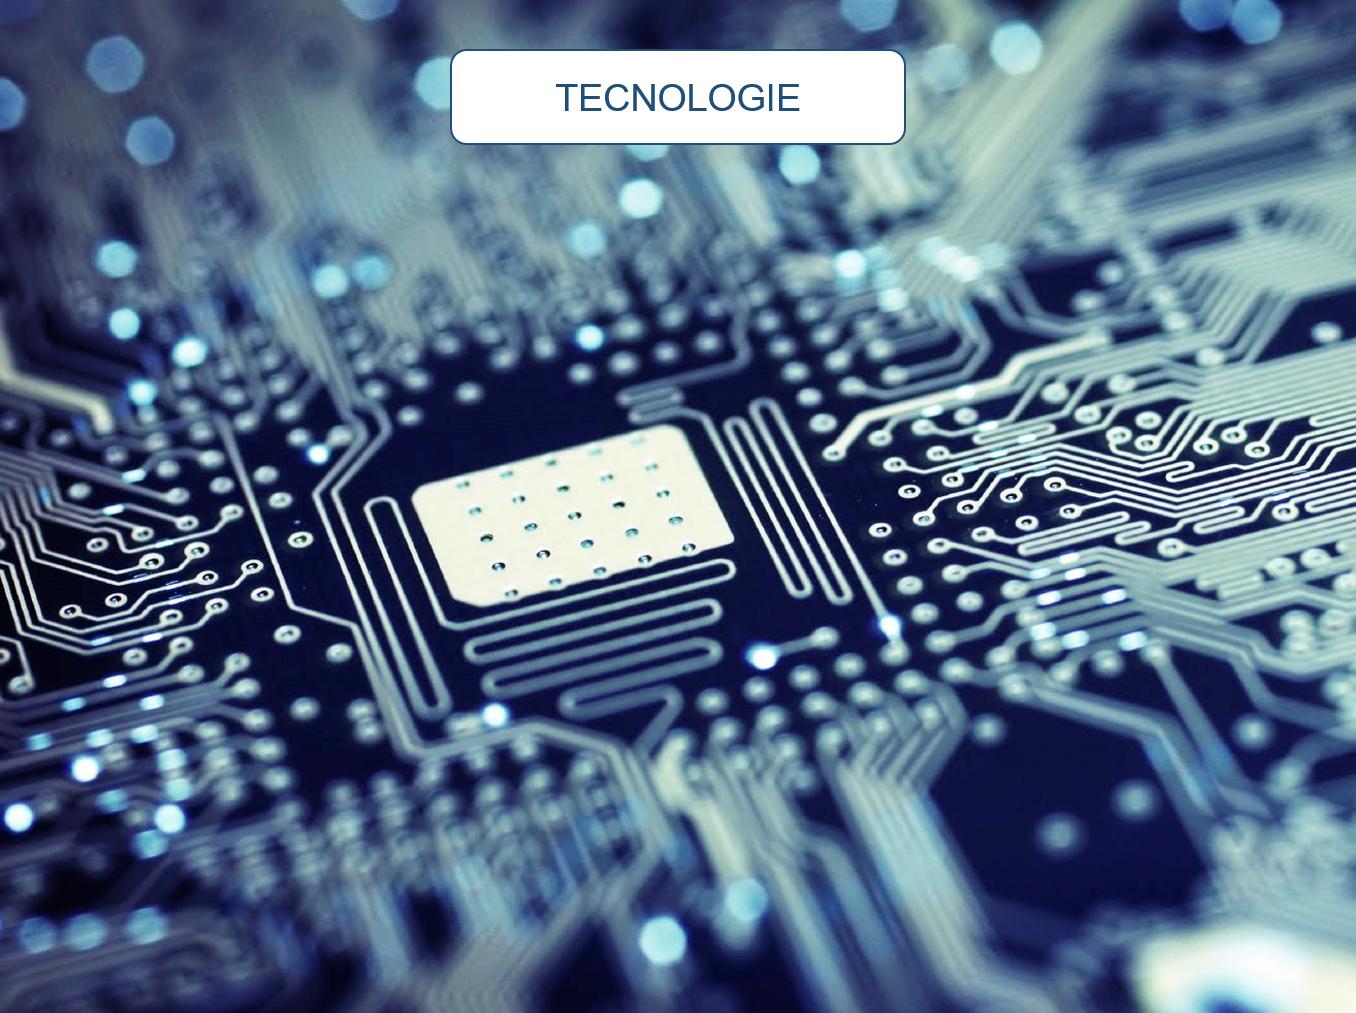 TECNOLOGIE